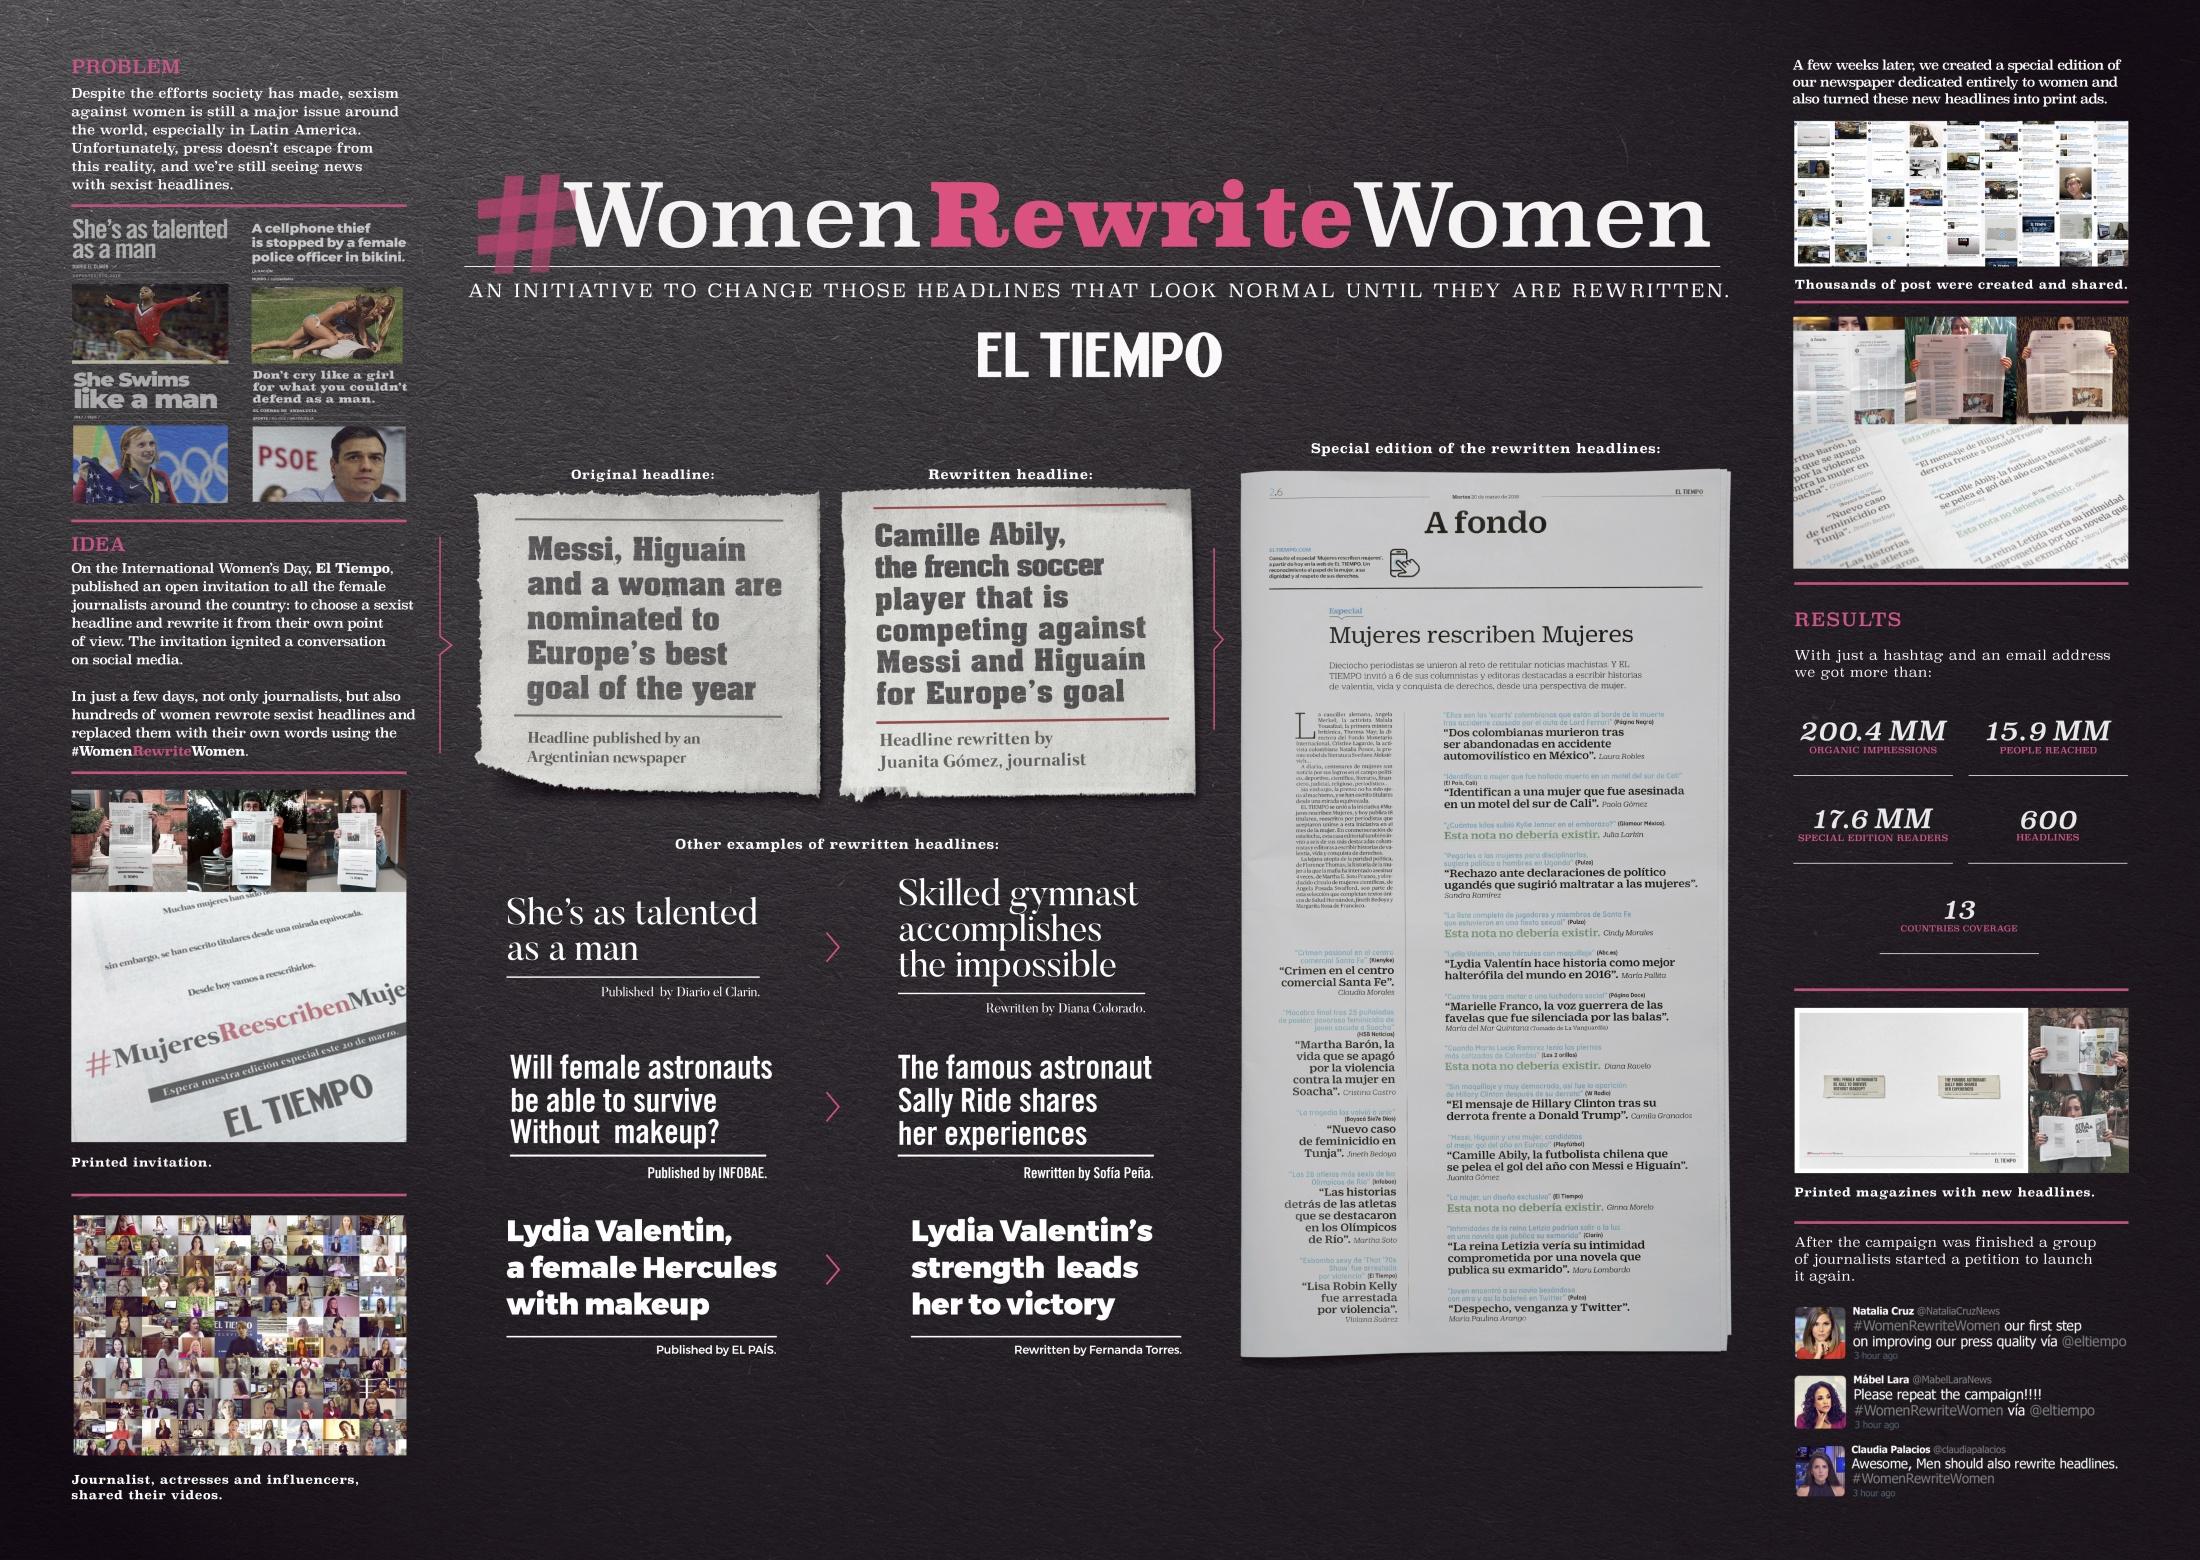 Thumbnail for Women Rewrite Women